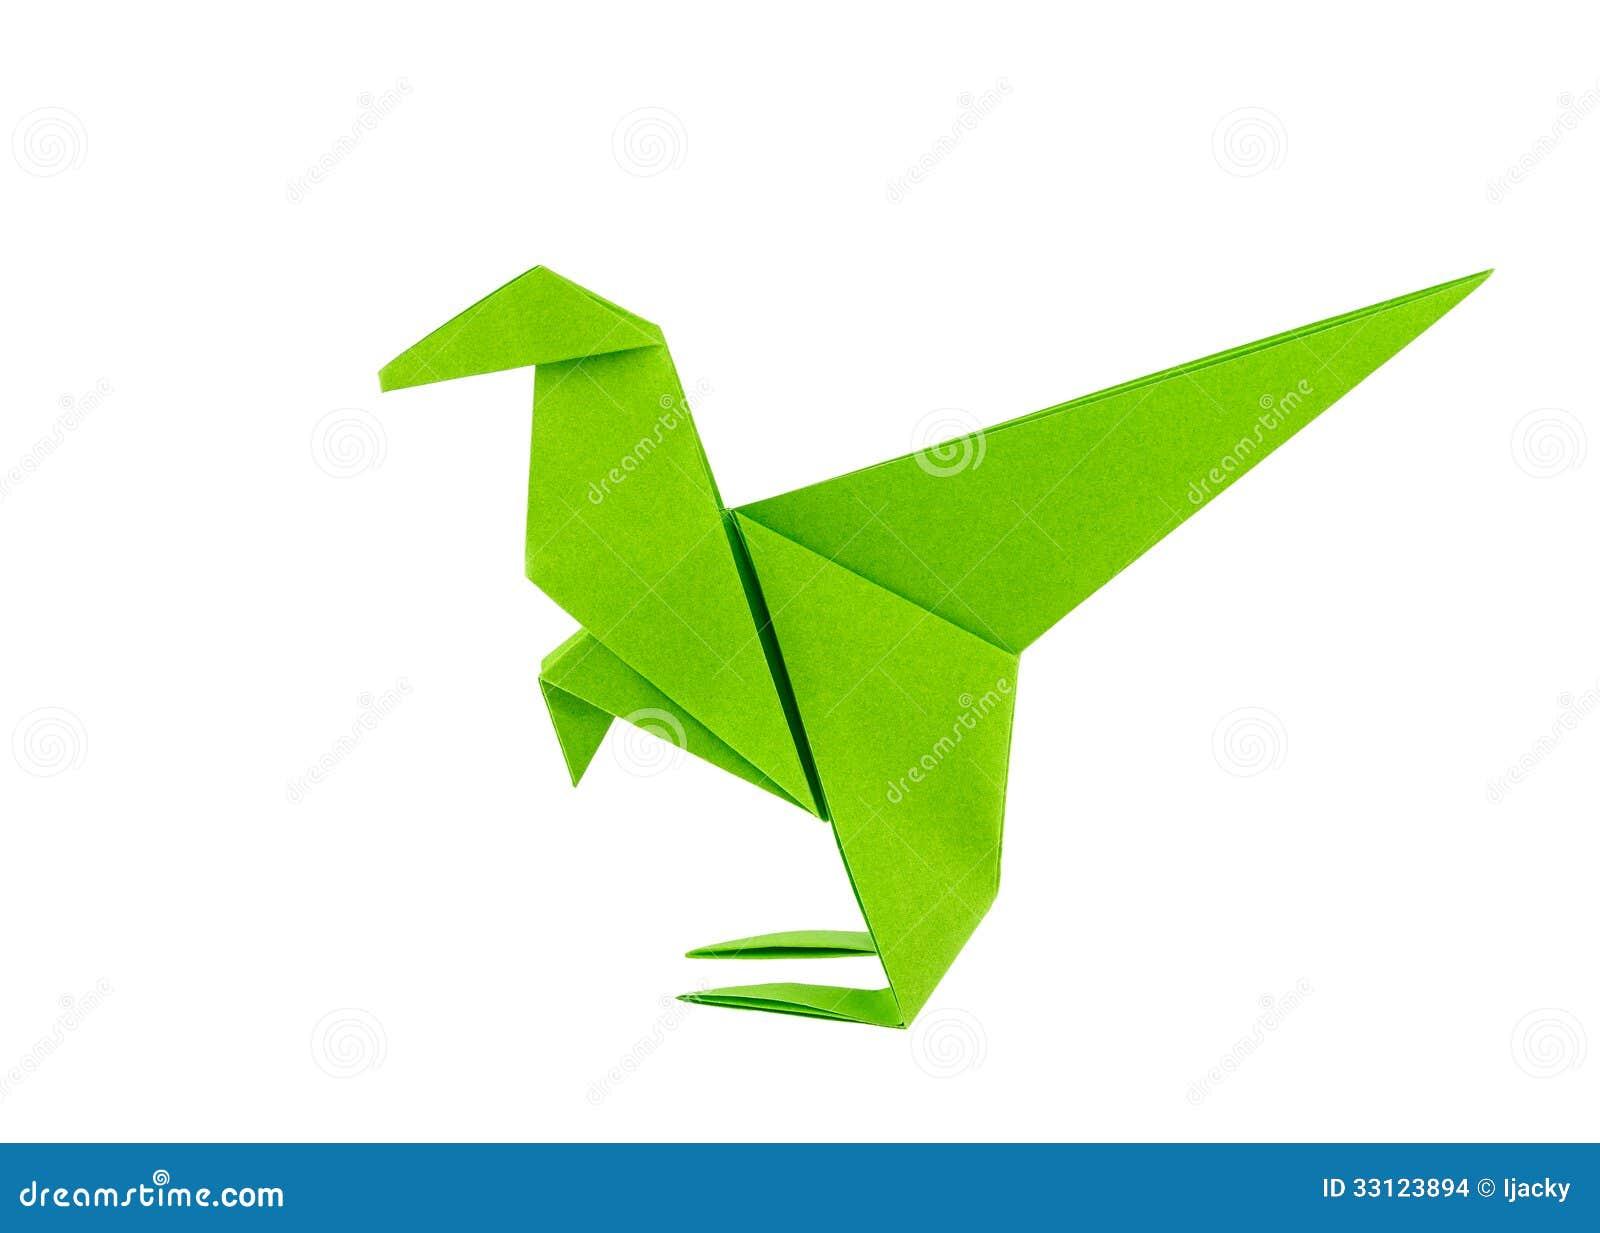 Origami Dinosaur - Raptor - Stock Images - Image: 33123894 - photo#47